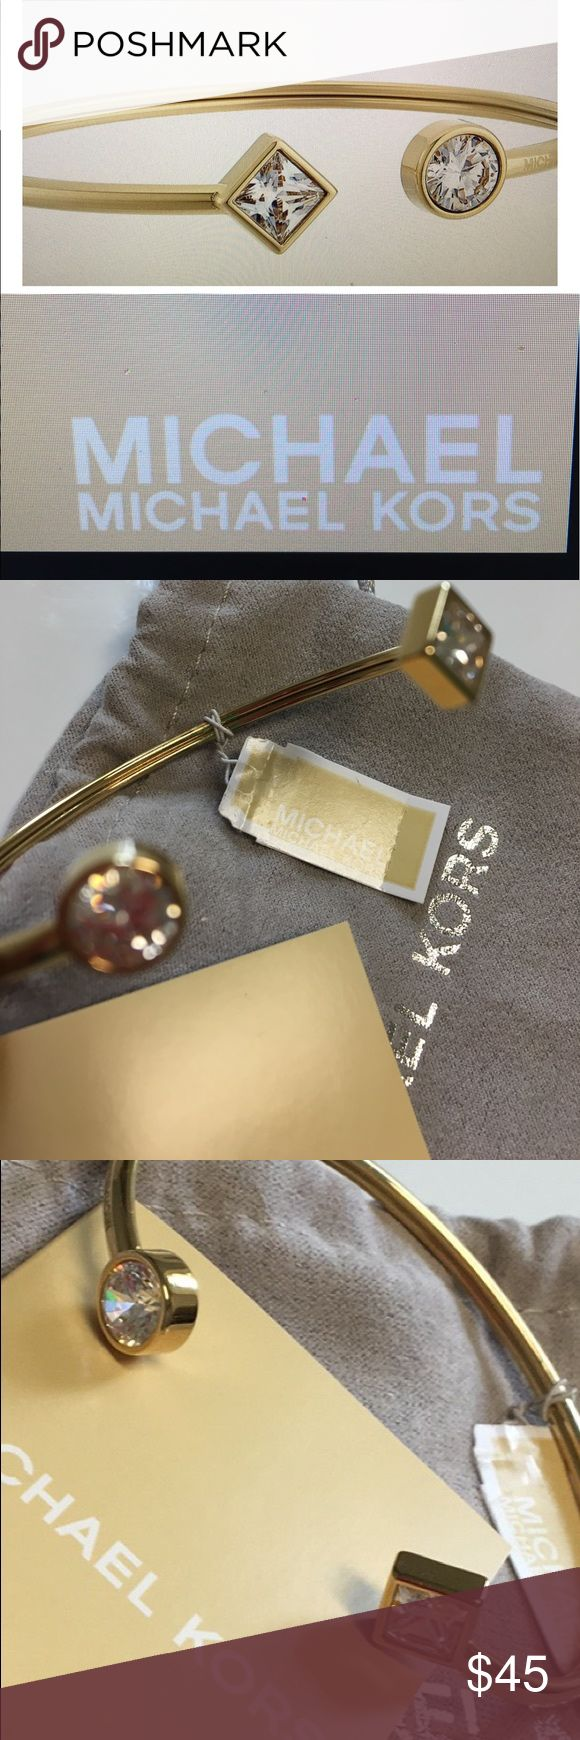 NWT MICHAEL KORS PARK AVENUE BRACELET Beautiful Michael Kors open cuff bracelet last seen at Neiman Marcus for $95 Michael Kors Jewelry Bracelets